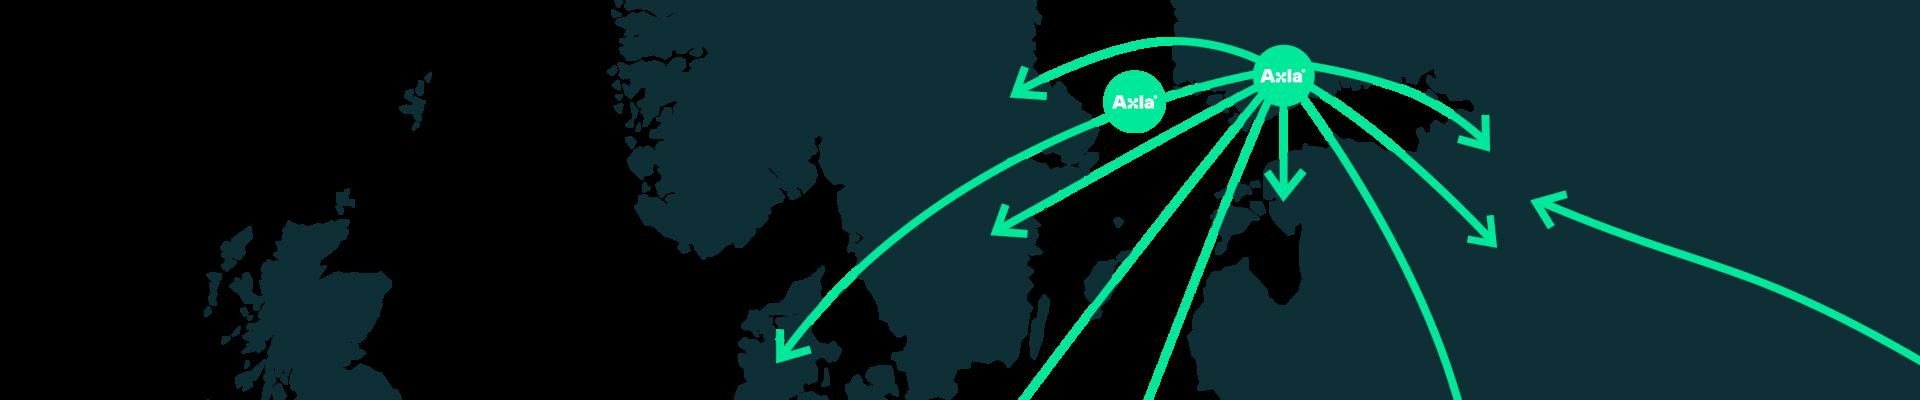 Axla maailmanlaajuista liiketoimintaa